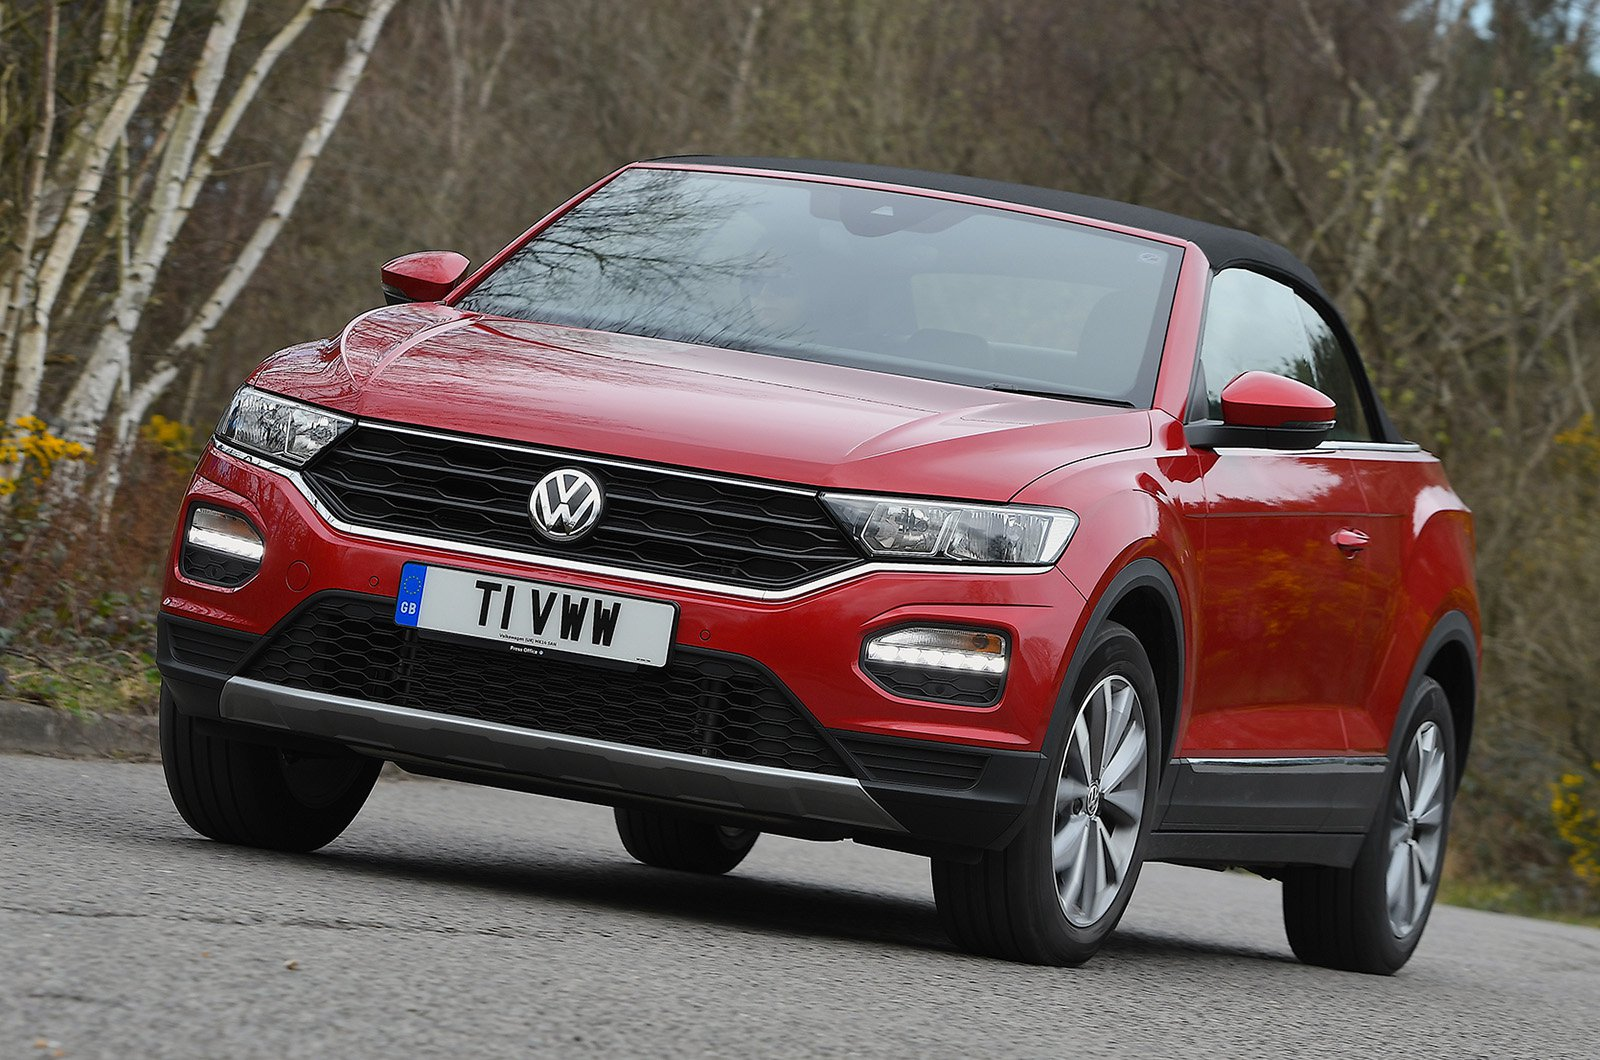 2020 Volkswagen T-Roc Cabriolet 1.5 TSI Design verdict